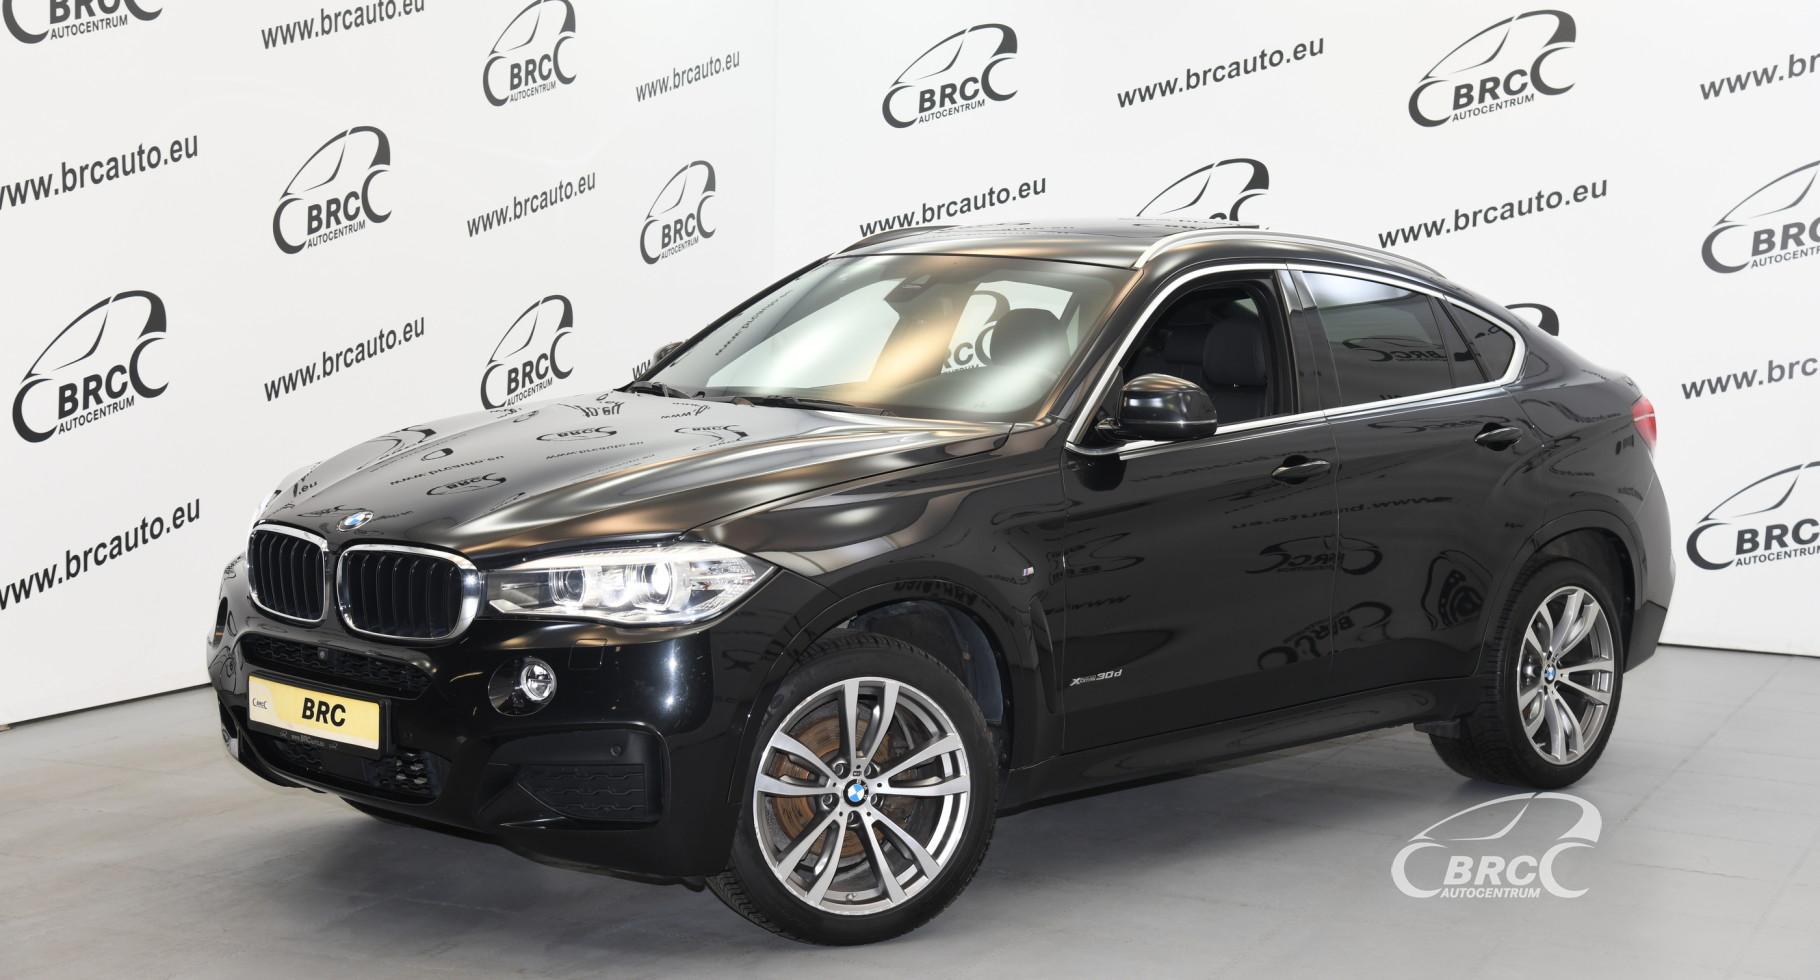 BMW X6 xDrive 30d M-packet Automatas